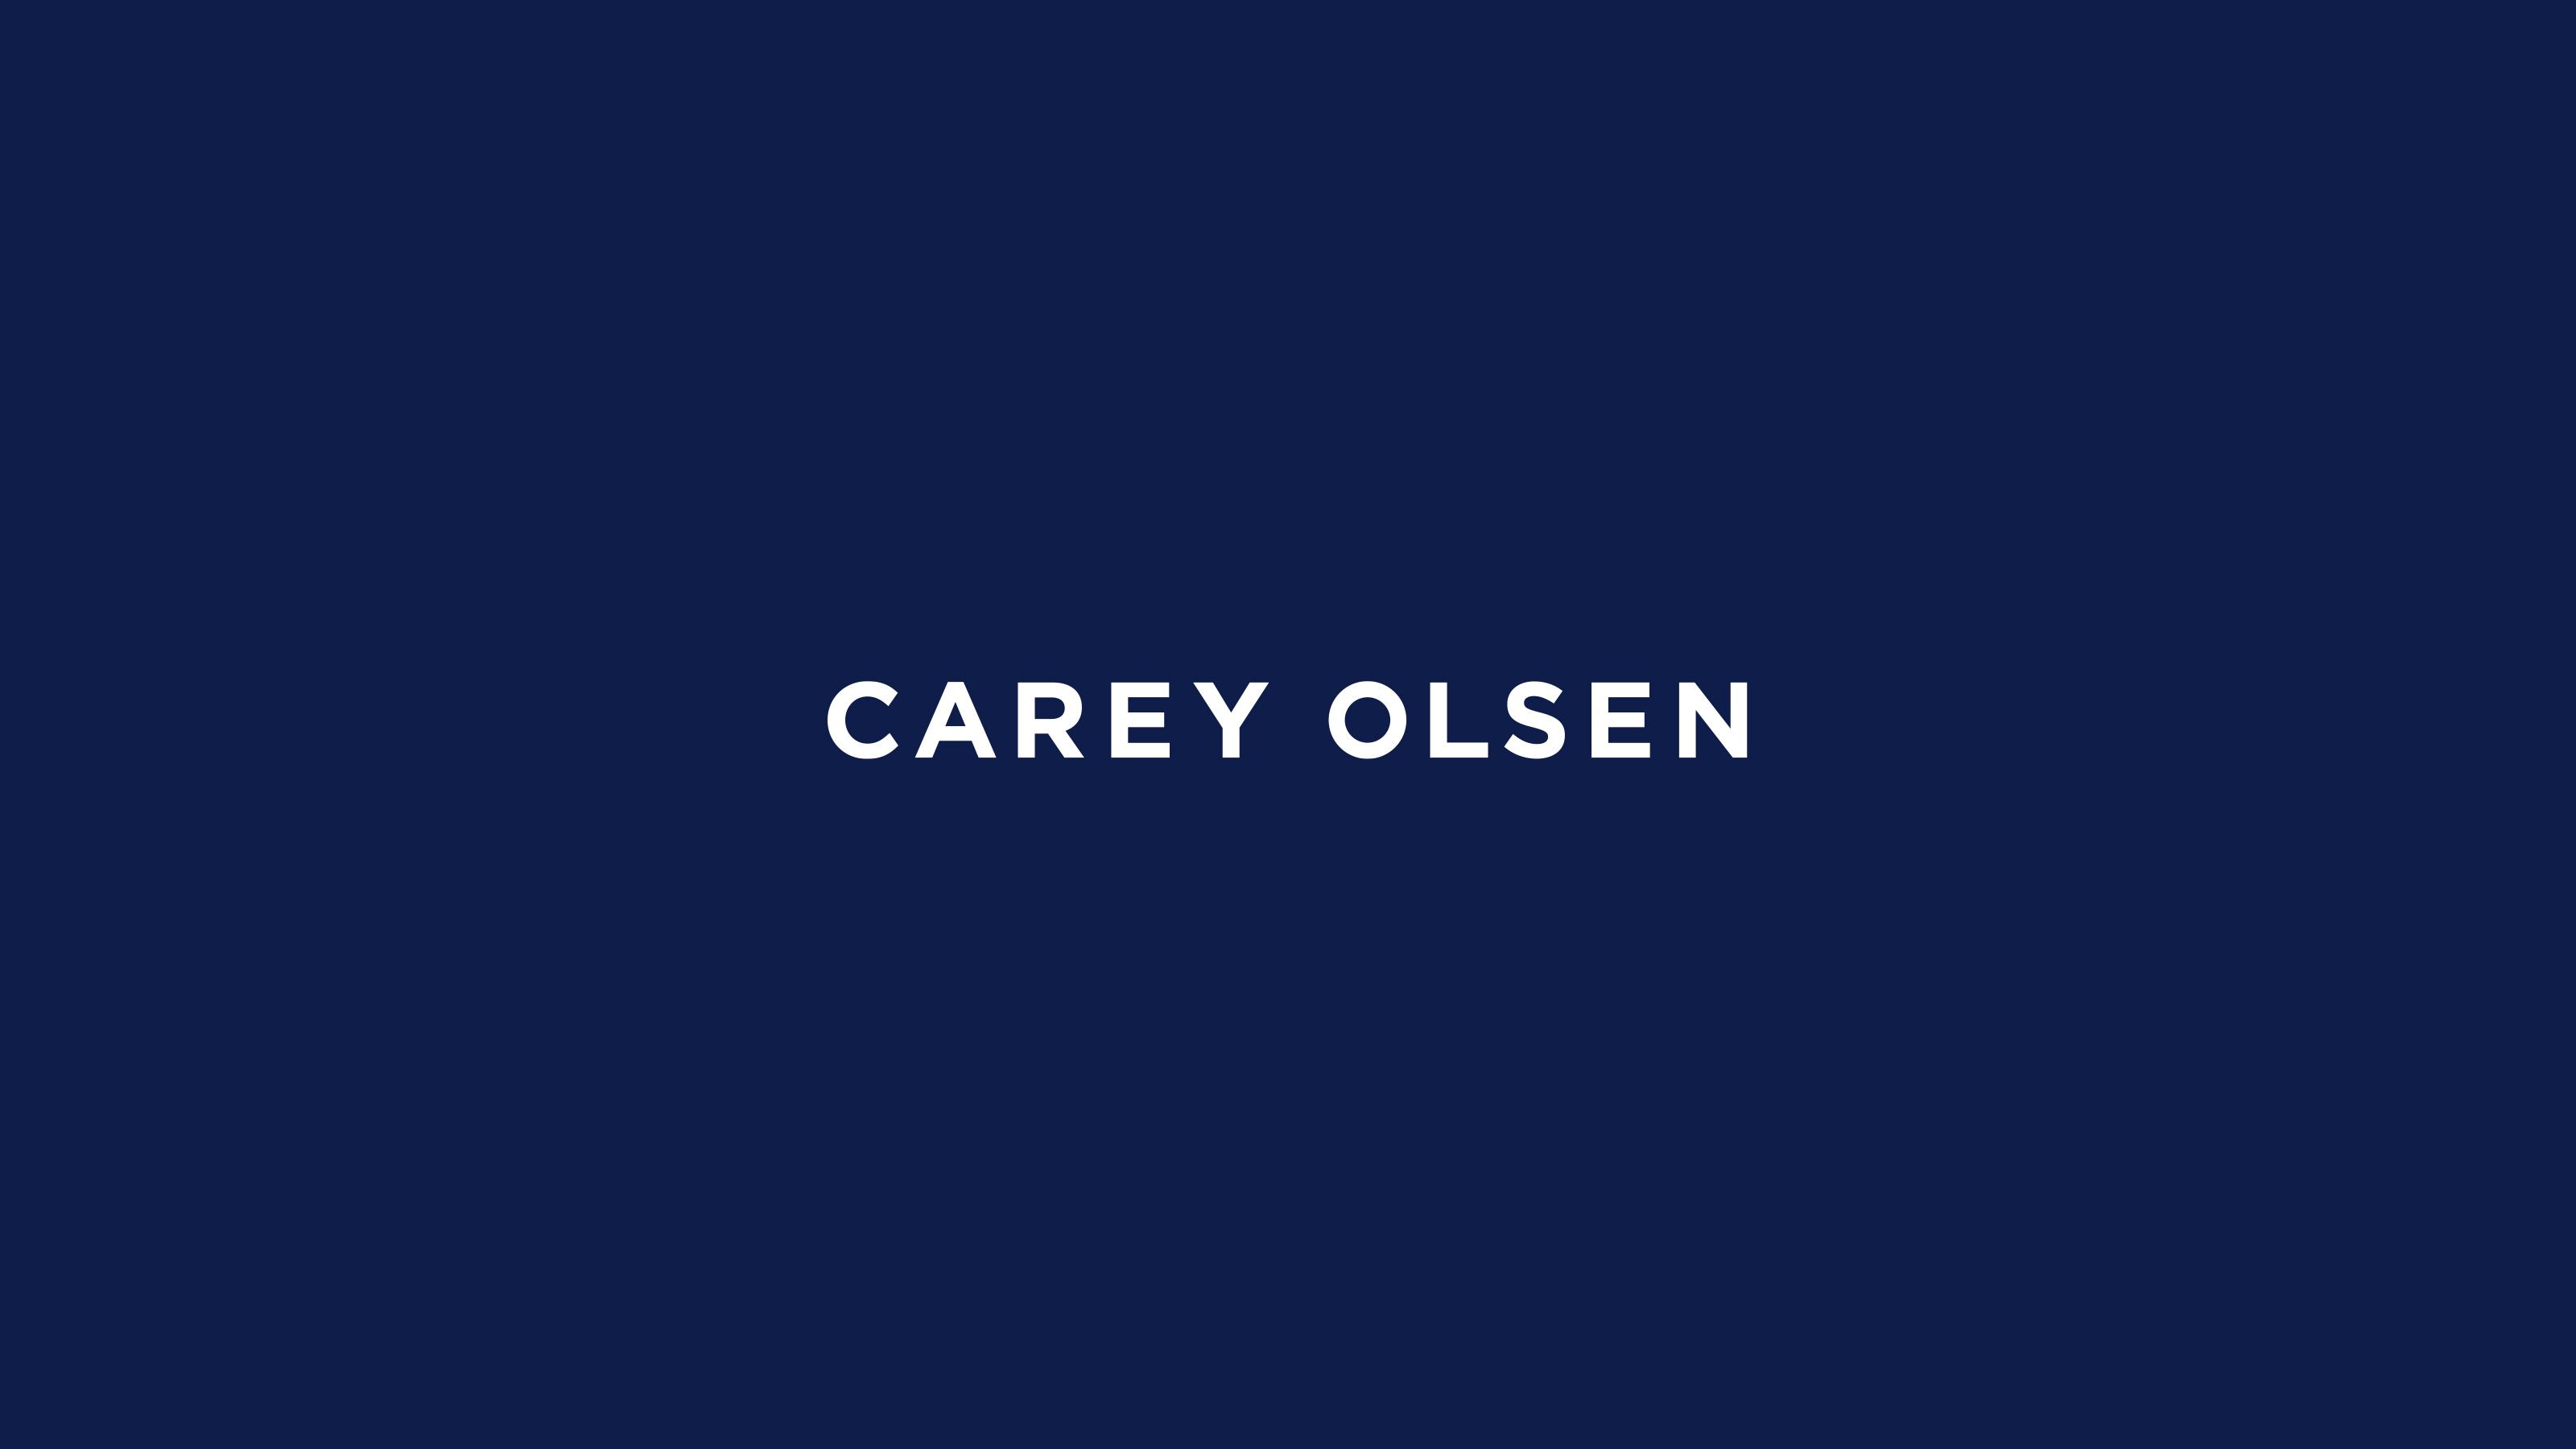 Brand logotype Carey